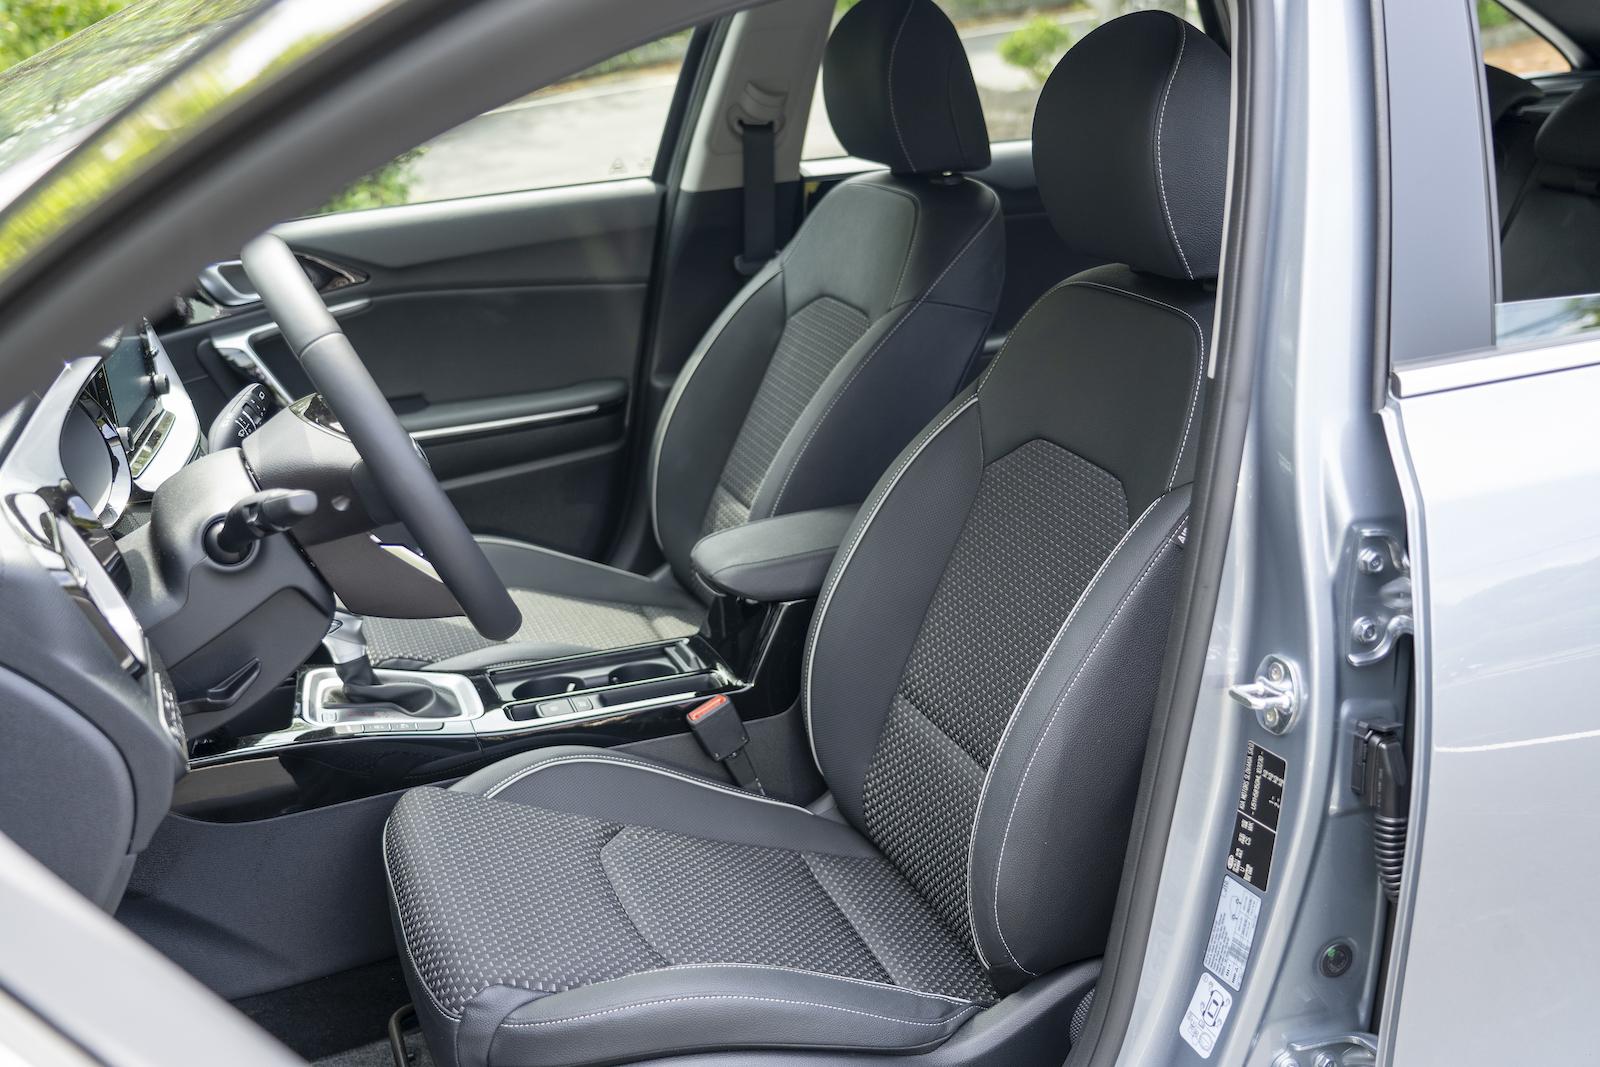 Deluxe歐風複合材質座椅,採用真皮、織布混搭的設計構成,但只提供手動調整。